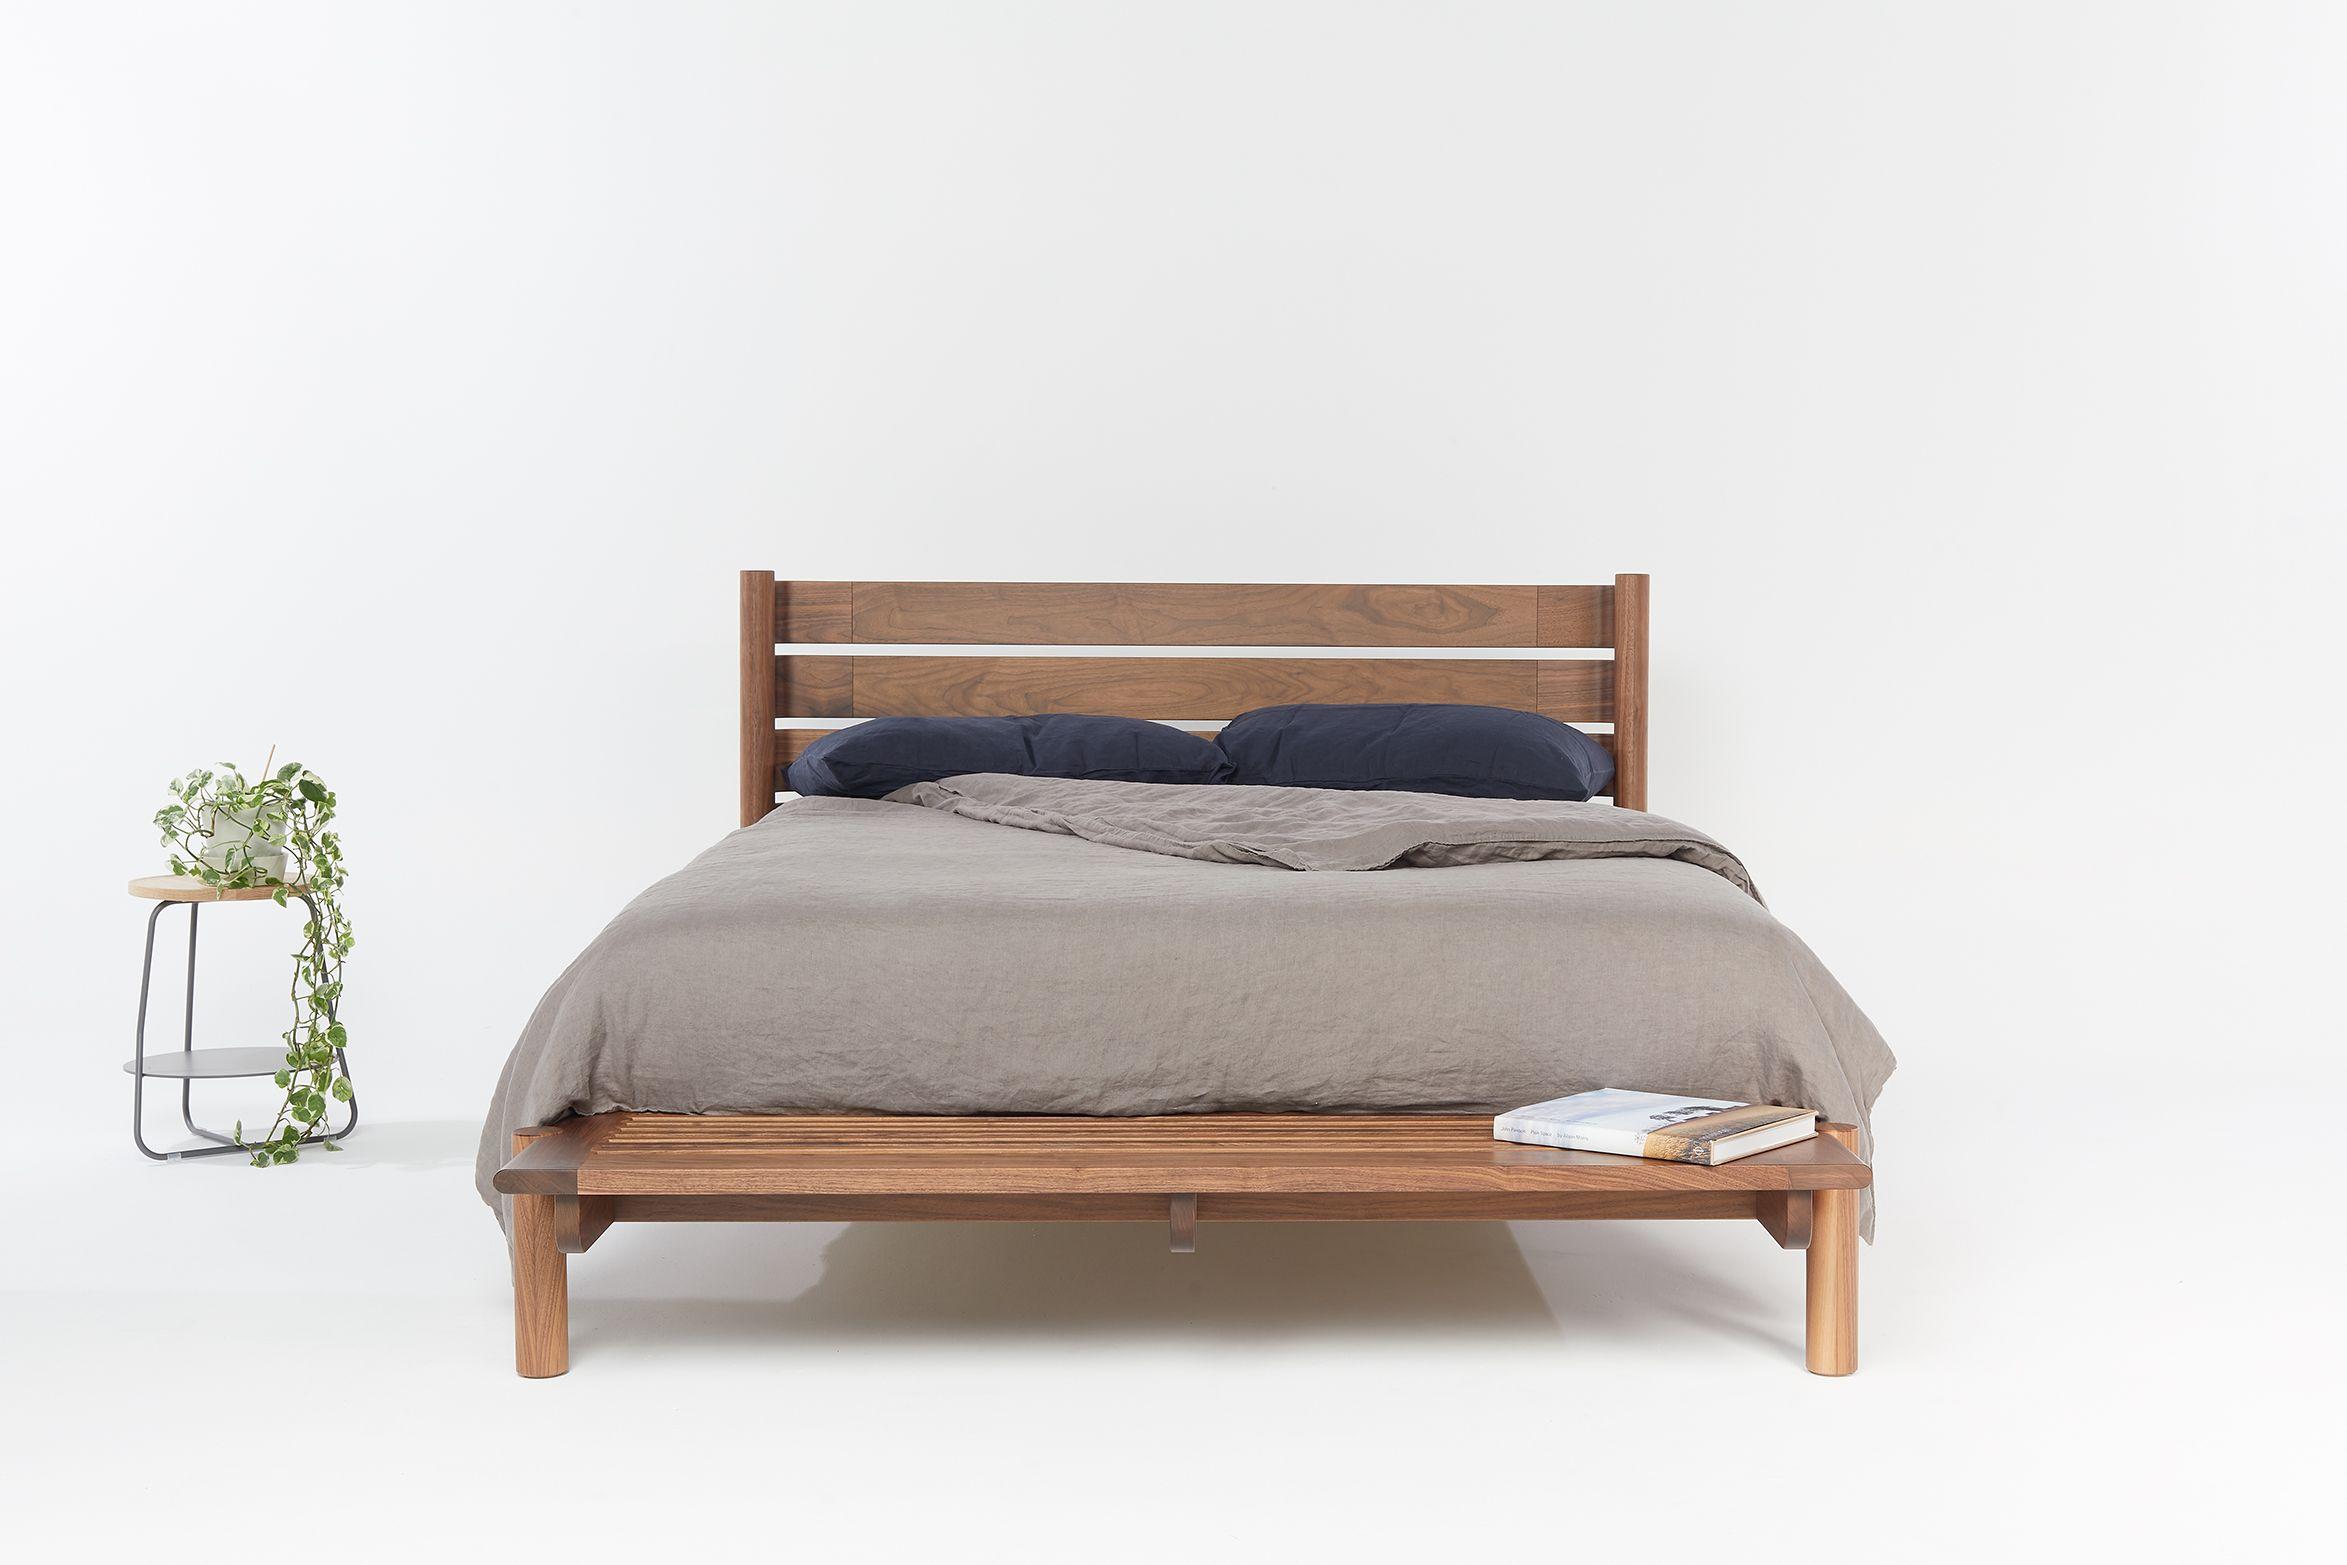 Title Bed 12 — Mast Furniture - Brisbane designed and made